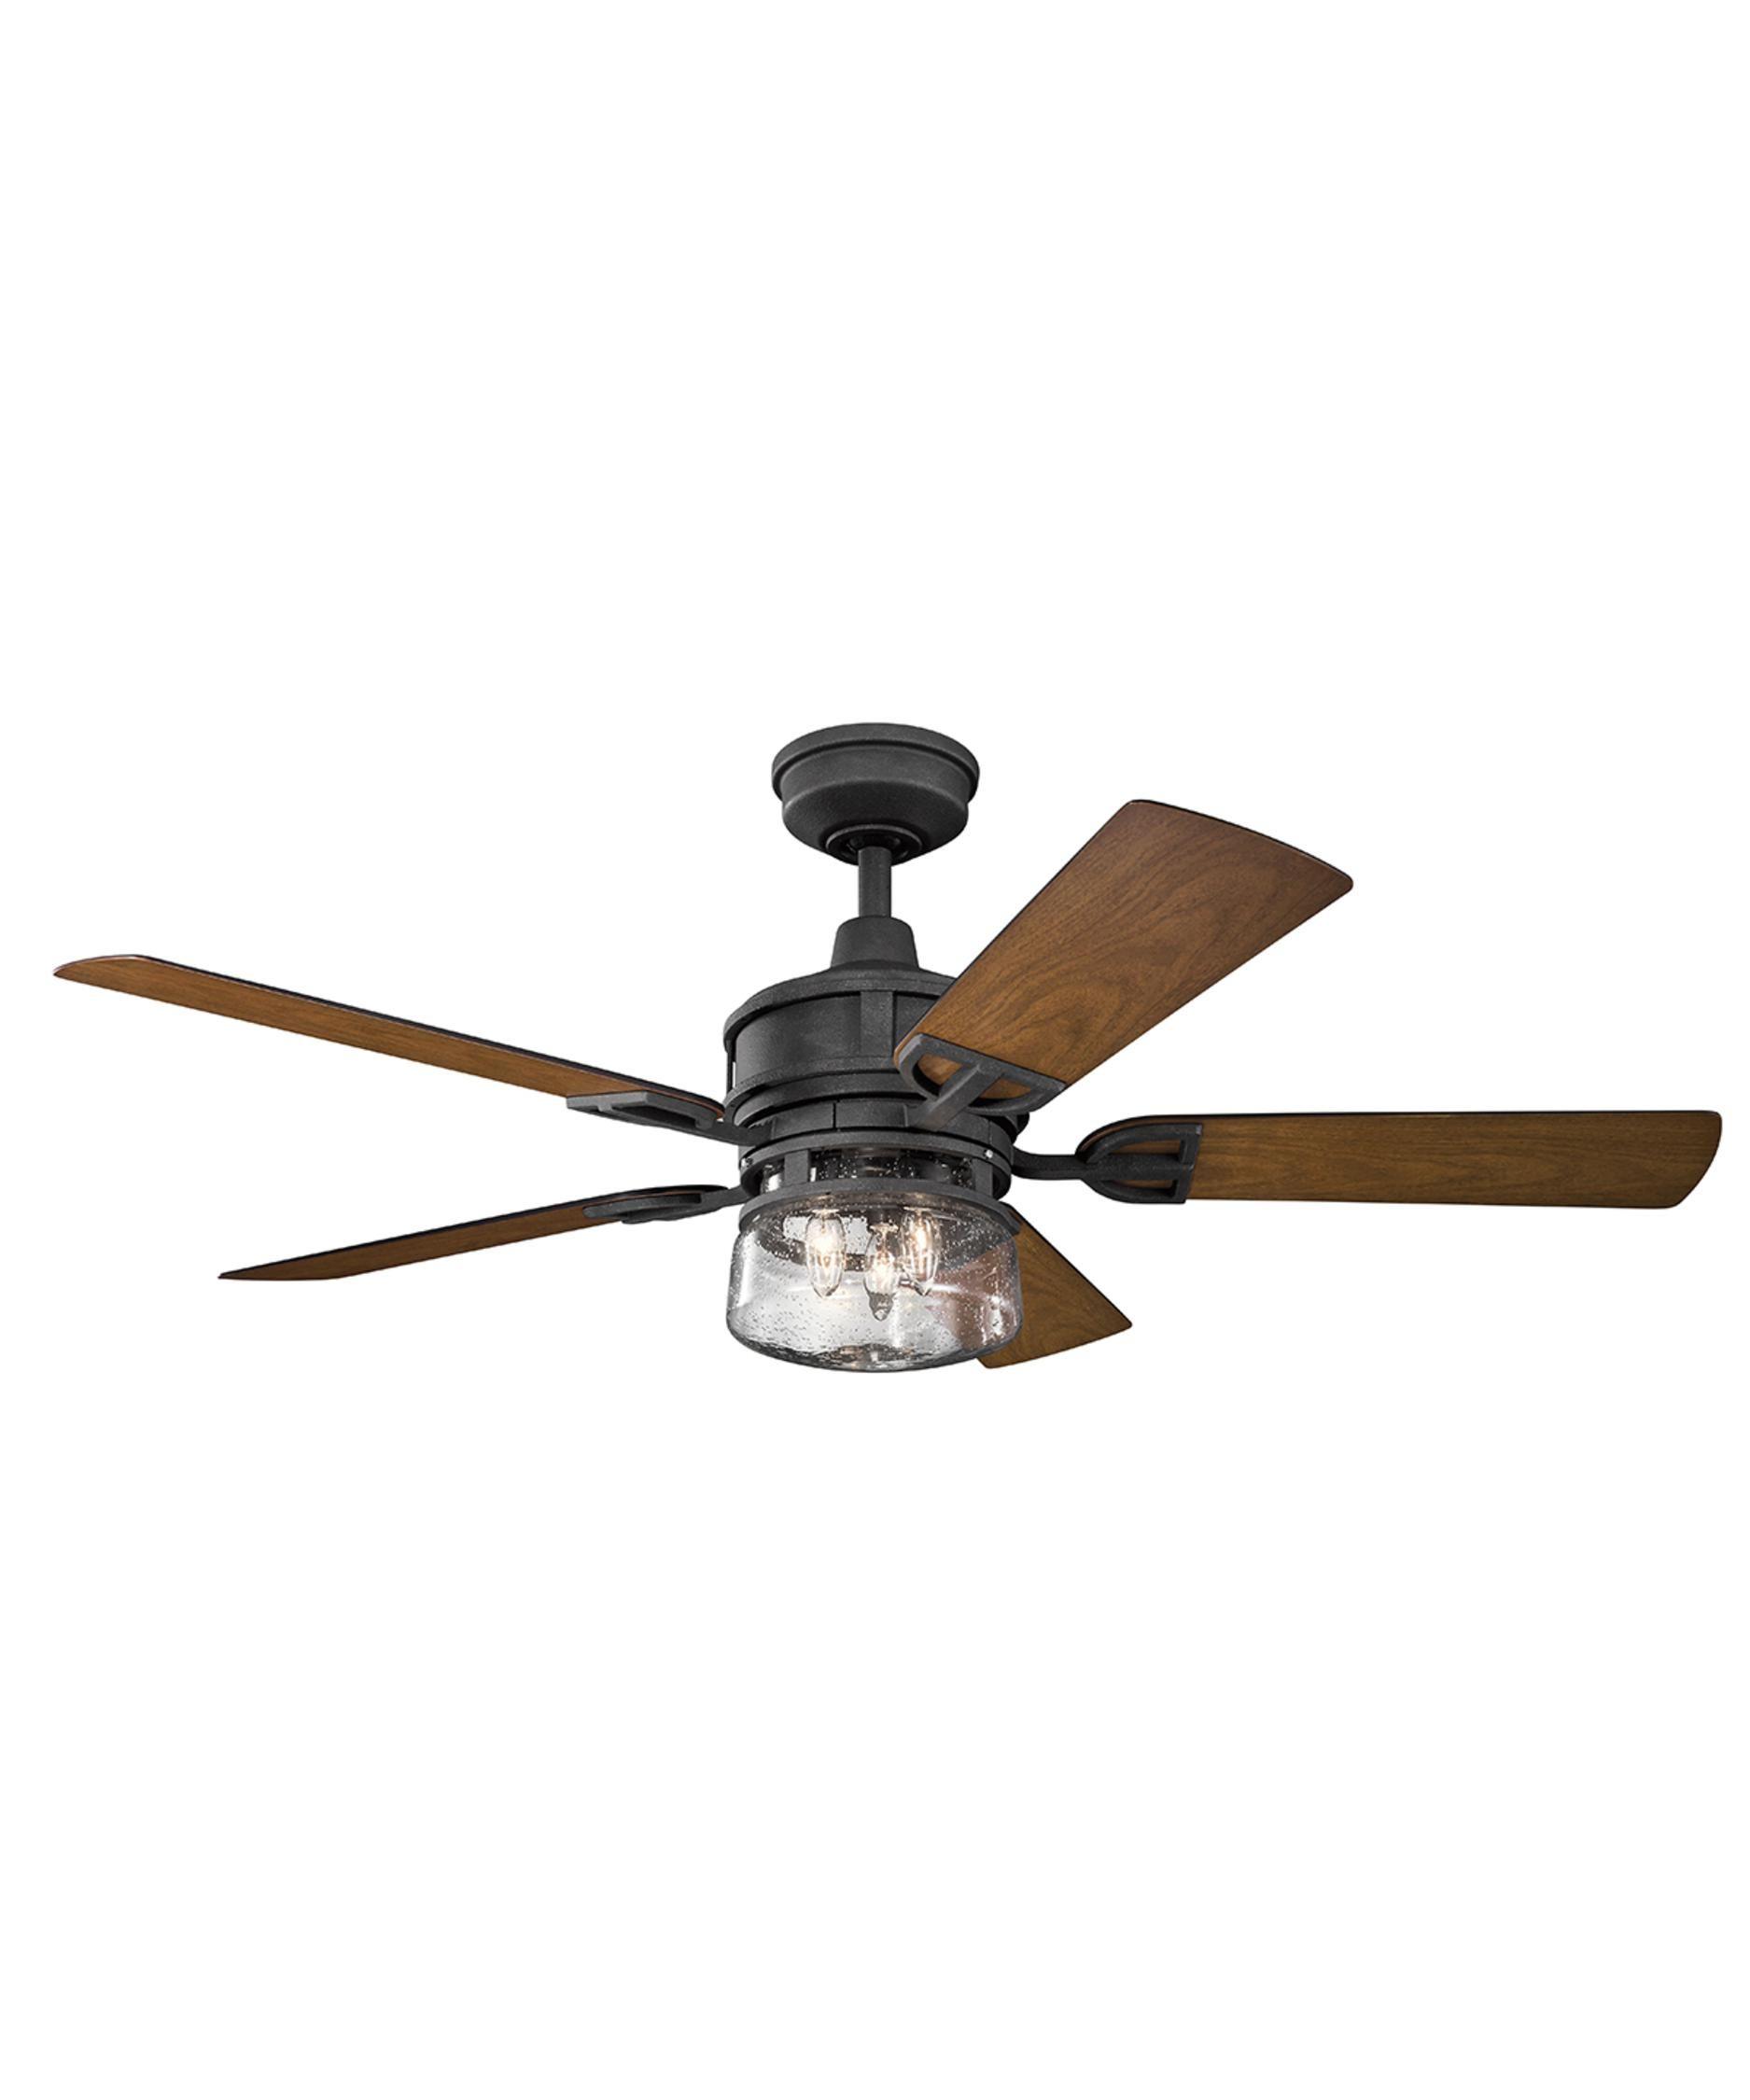 Kichler 310139 Lyndon Patio 52 Inch Ceiling Fan With Light